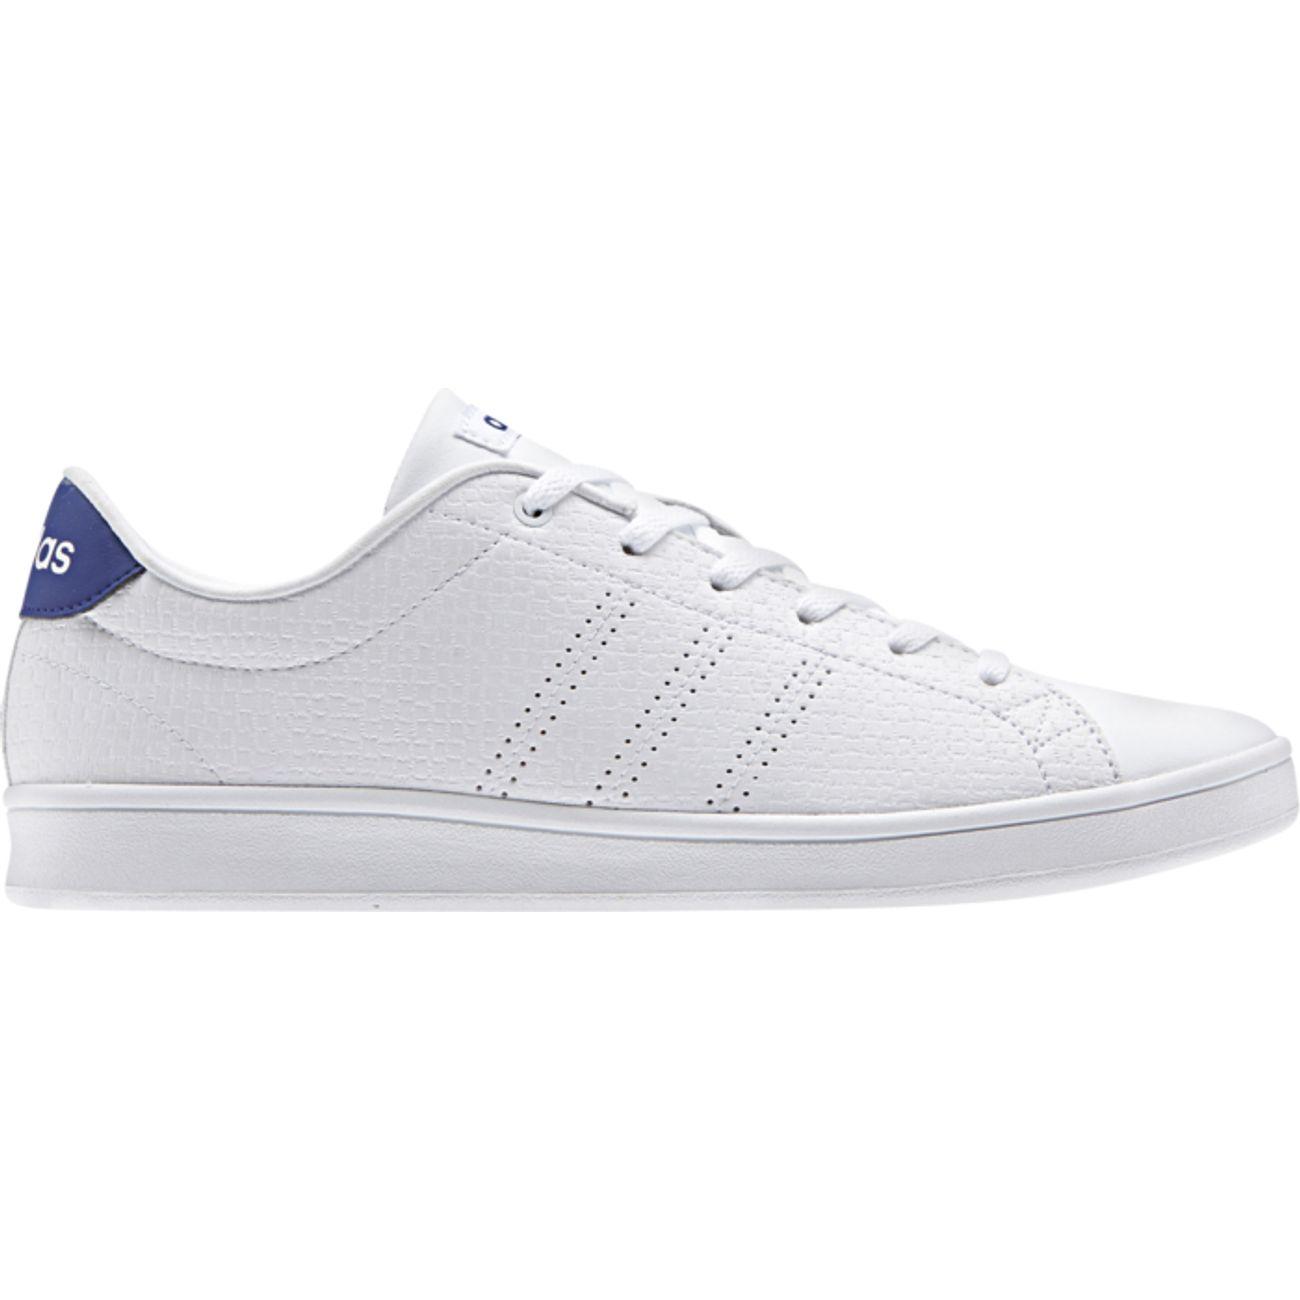 buy online b6212 b410b Adidas Advantage Clean Qt Baskets Basses OJgsdb